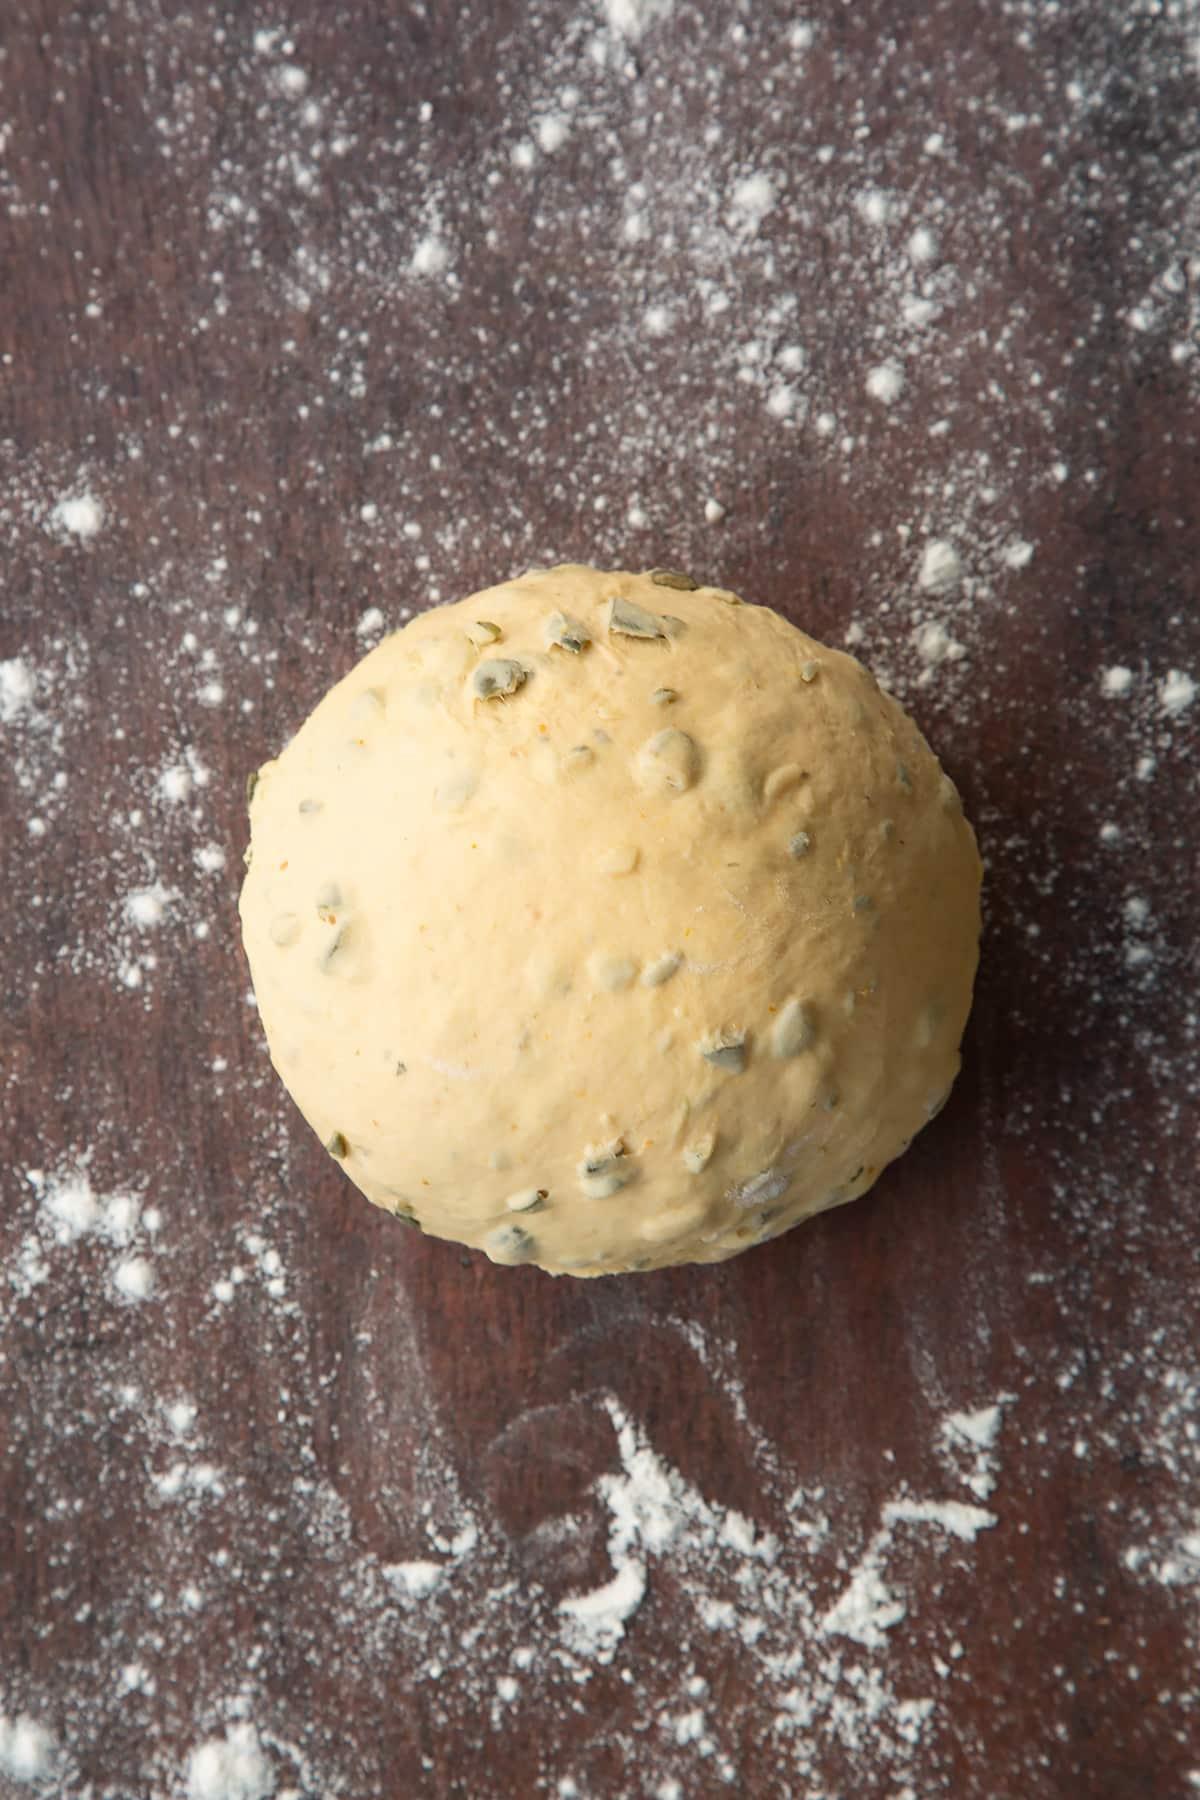 A ball of pumpkin seed bread dough on a floured surface.